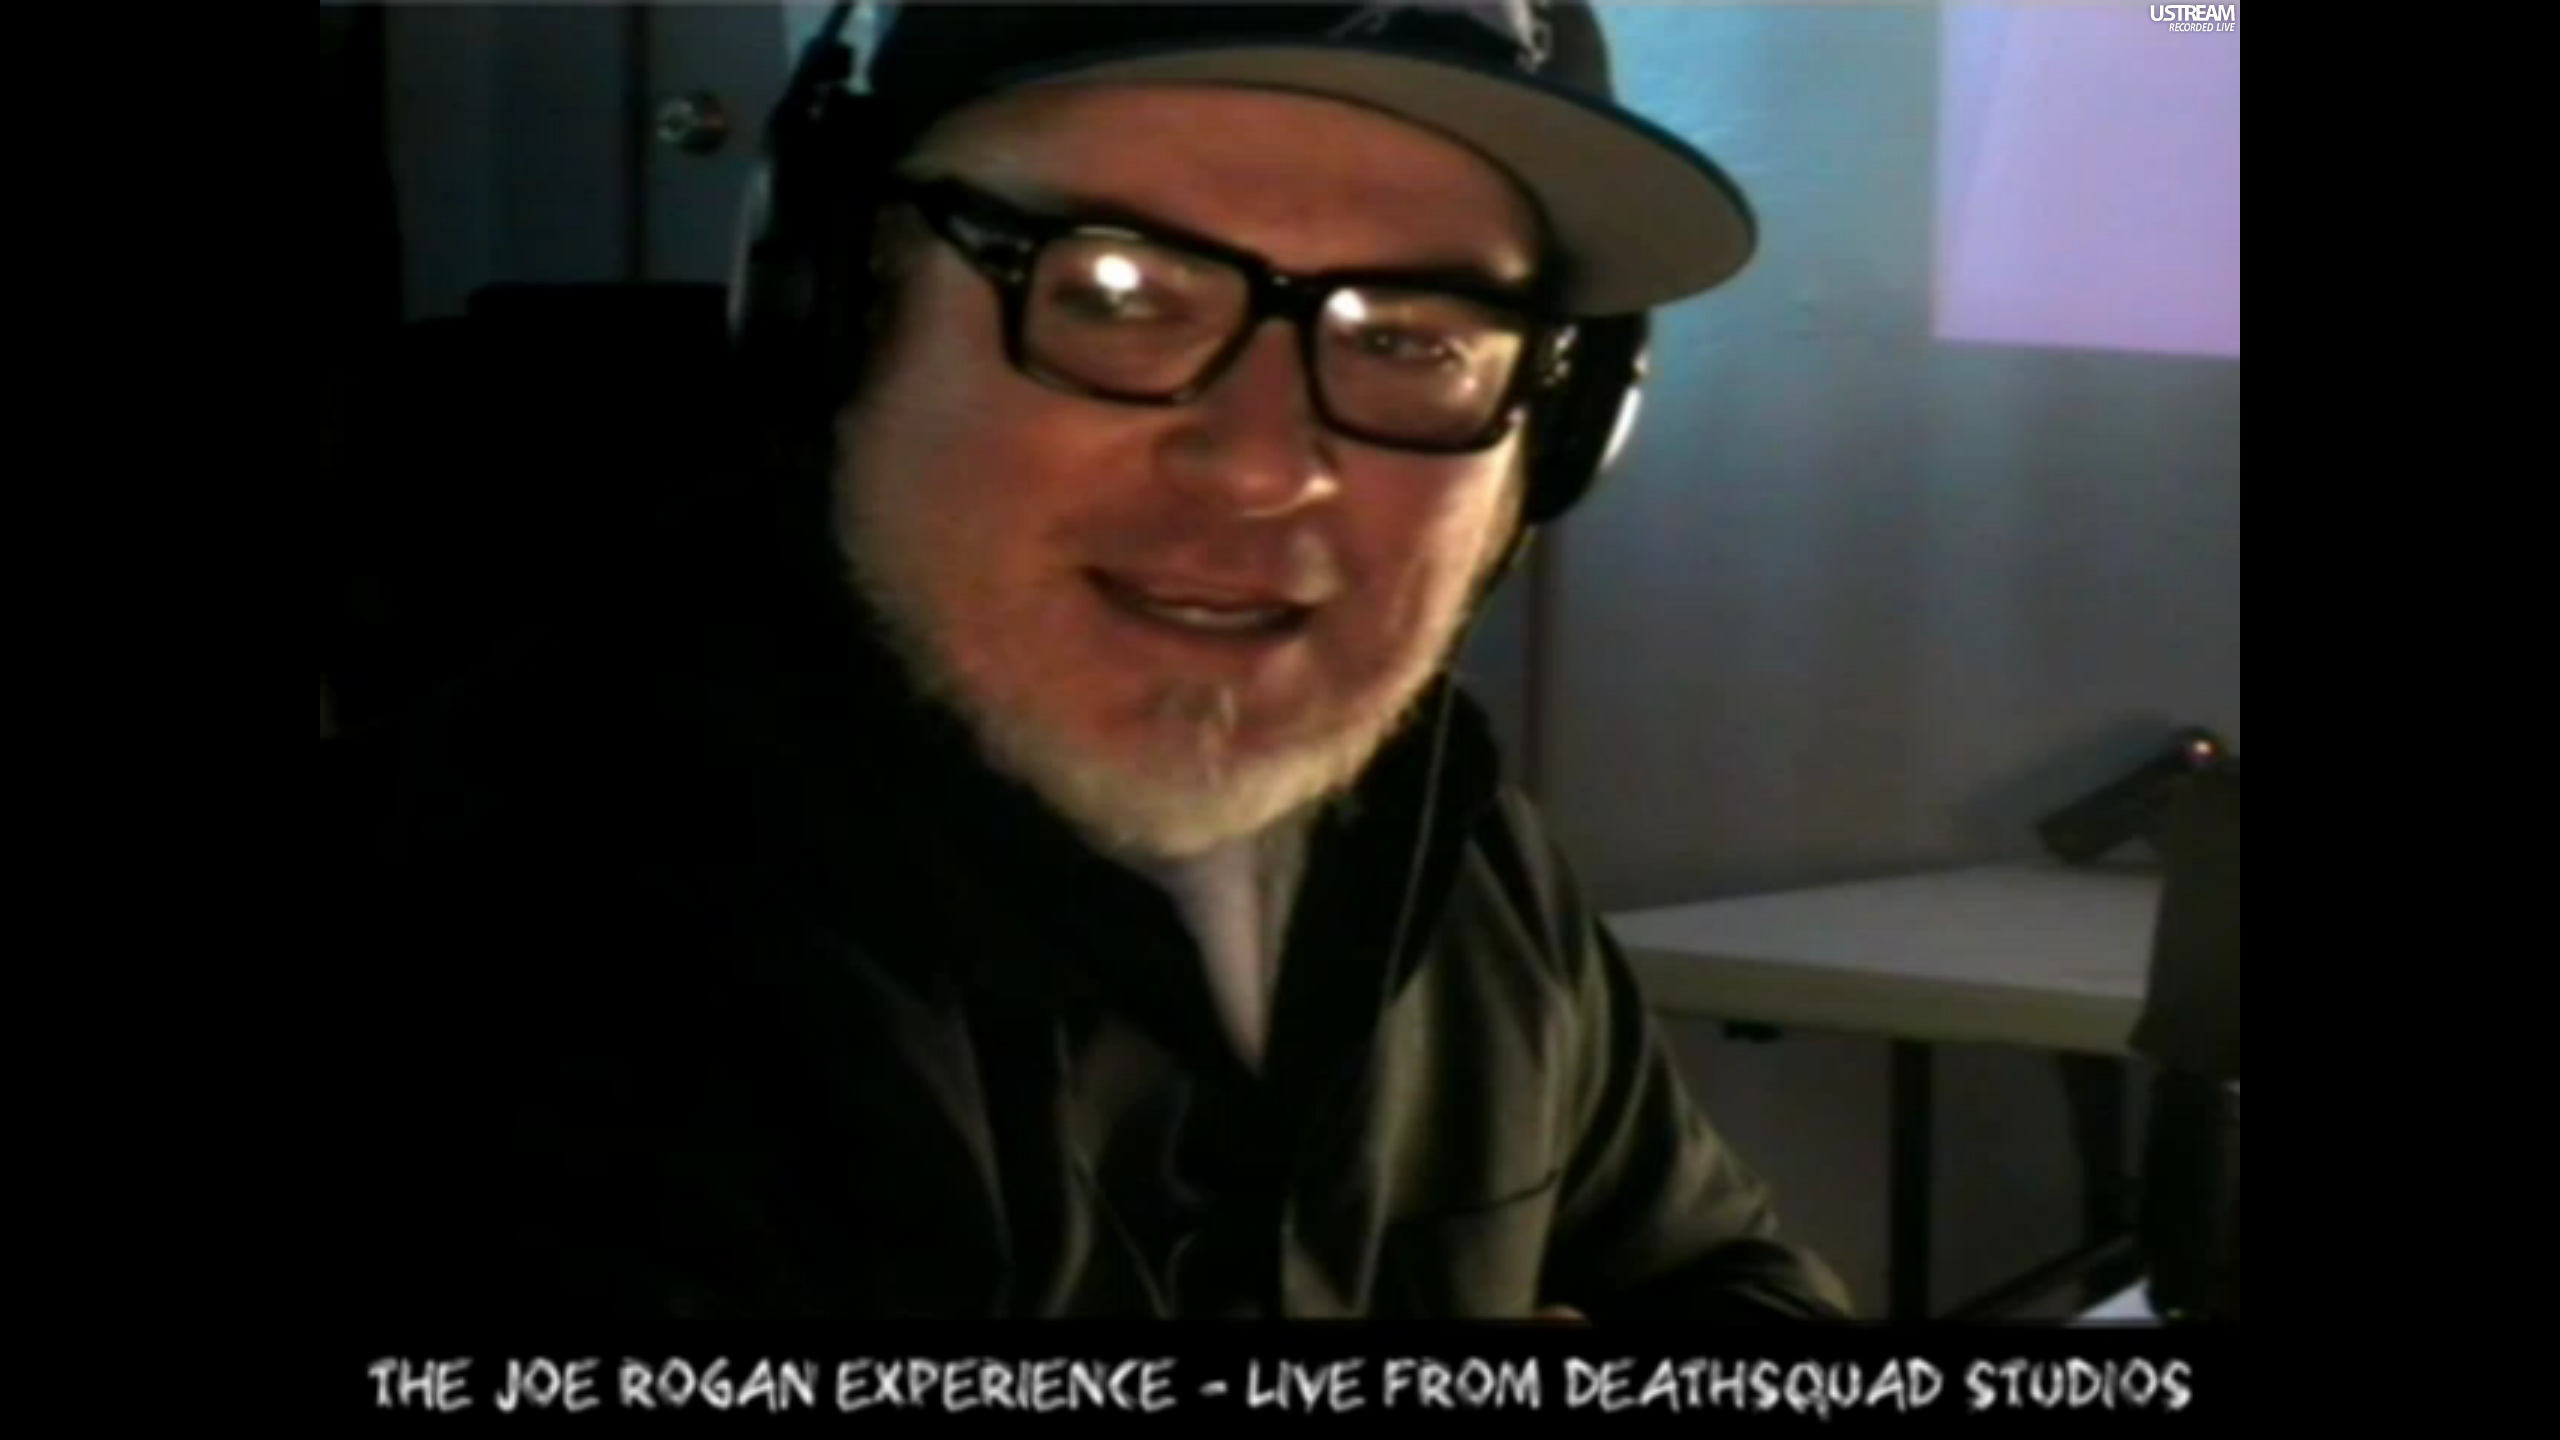 The Joe Rogan Experience PODCAST #171 - EVERLAST, Brian Redban